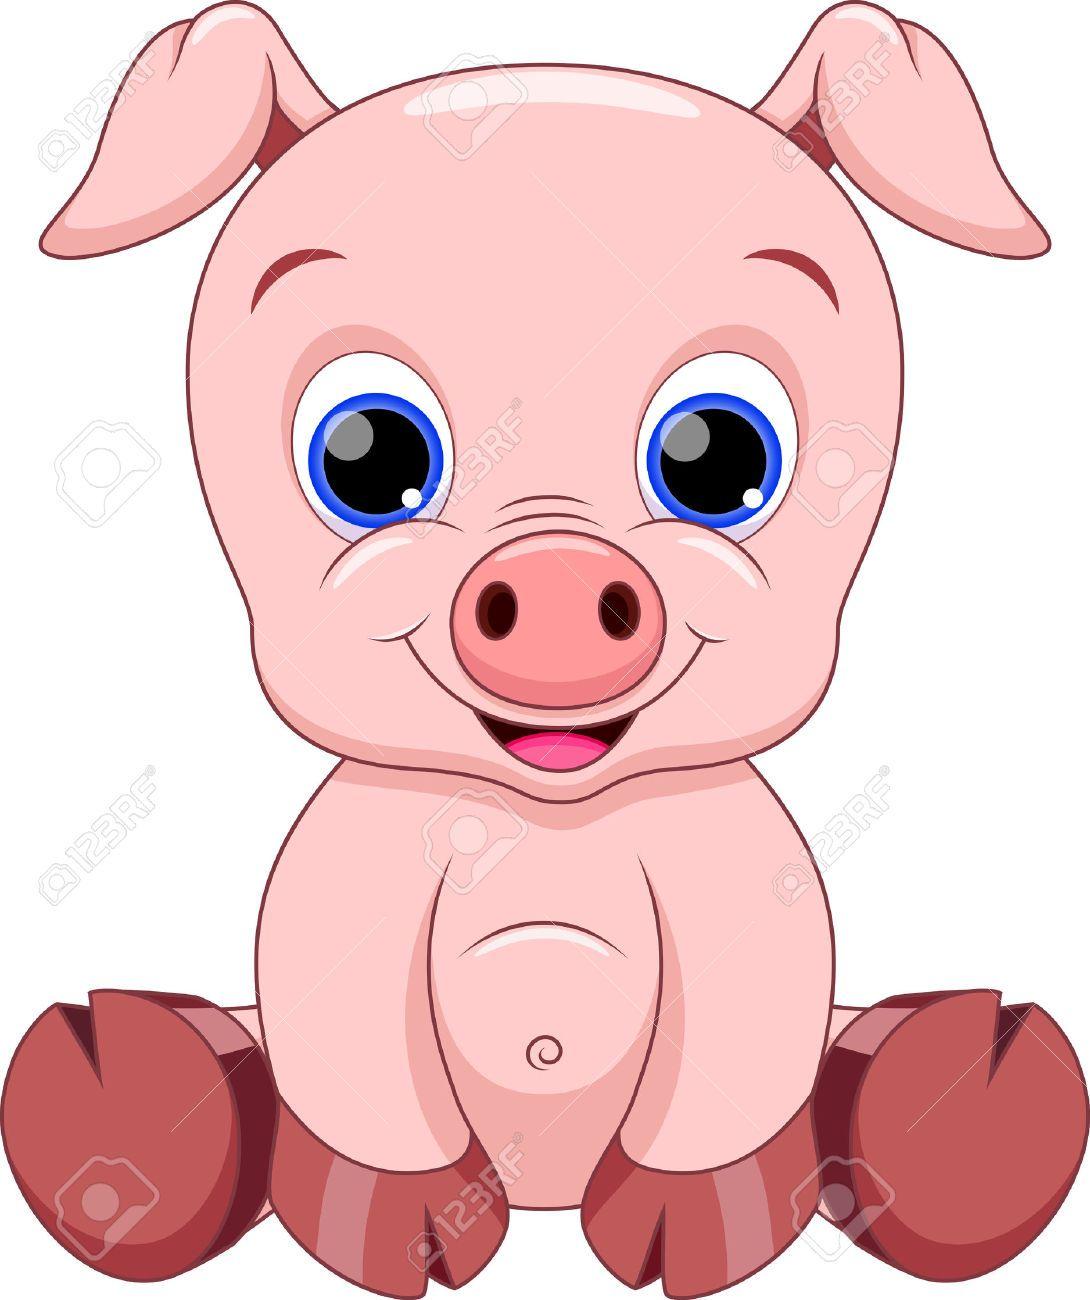 pig illustration | Piggy Art | Pinterest | Pig illustration